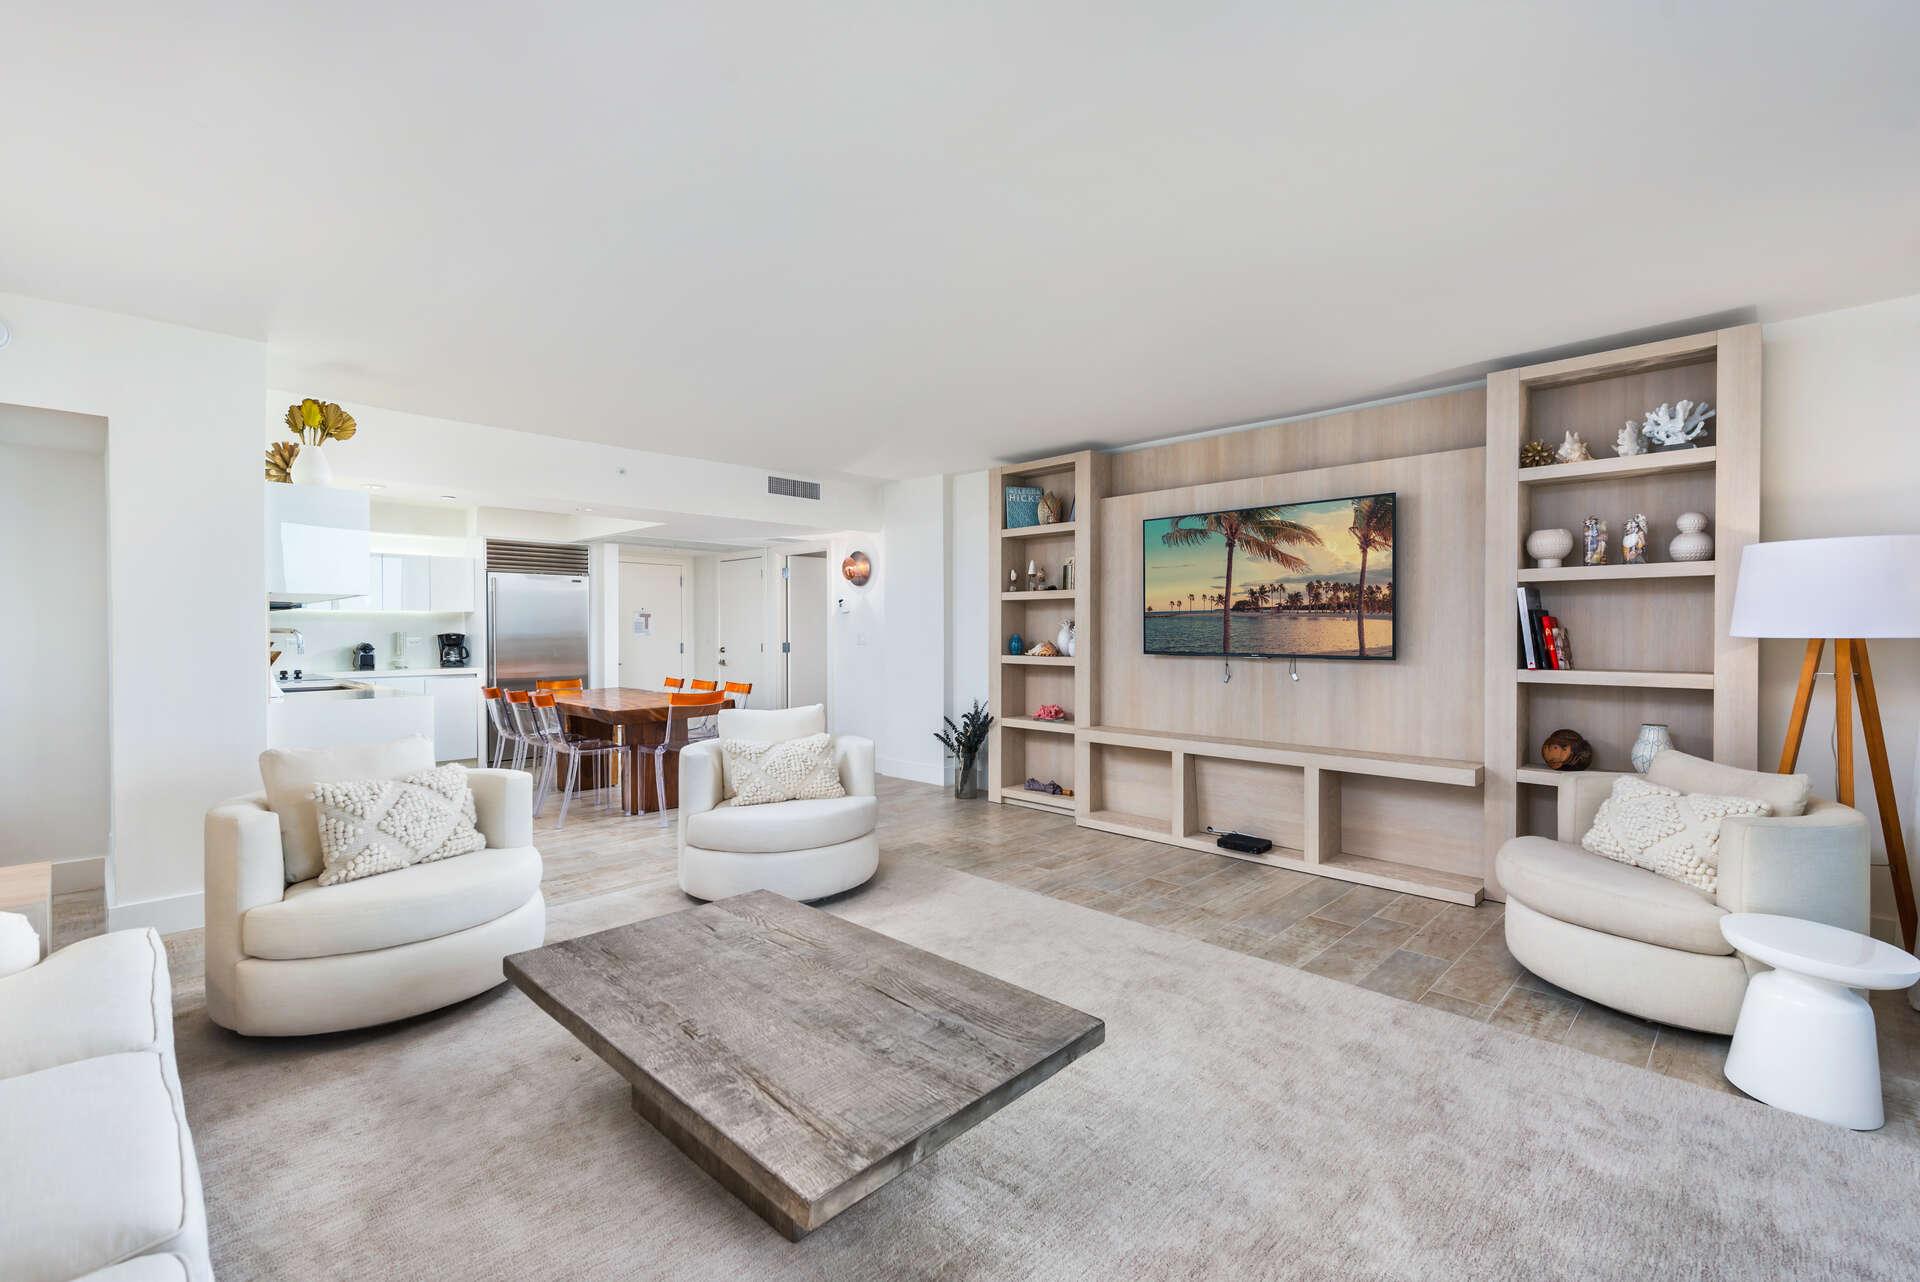 Luxury vacation rentals usa - Florida - Miami beach - Eco hotel southbeach - #1122 | 2 BDM Oceanfront - Image 1/28